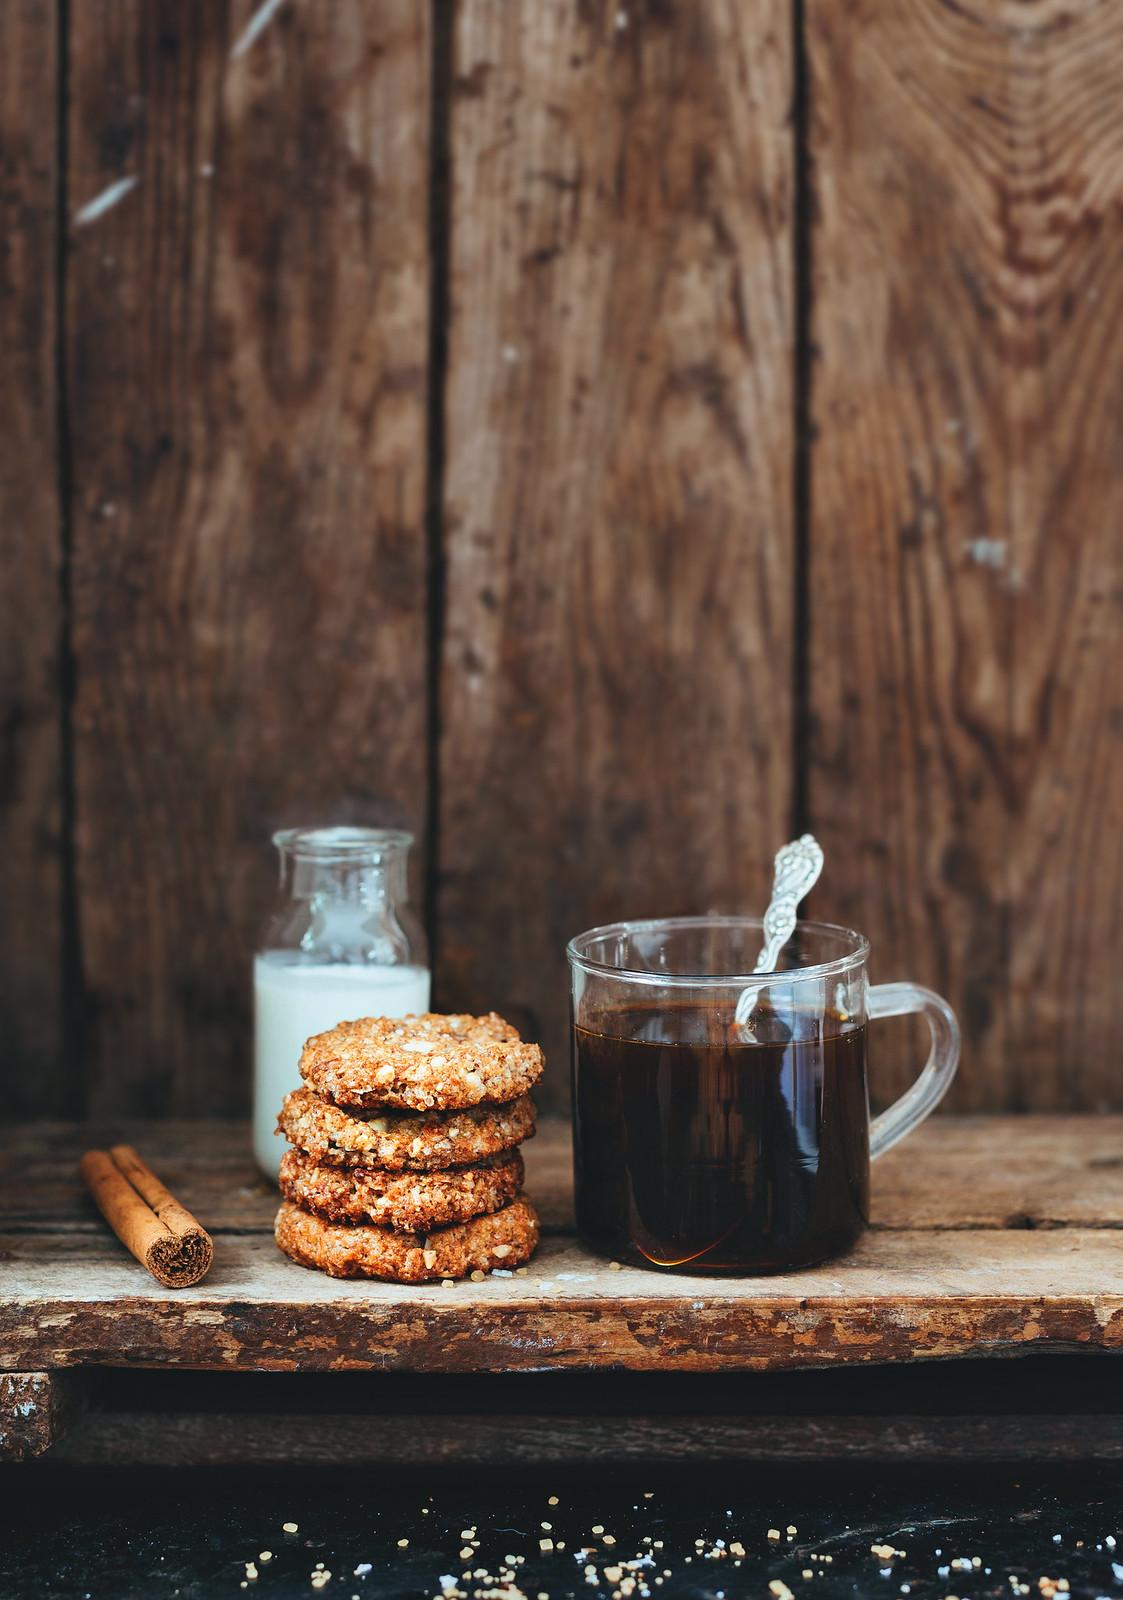 Glutenfria småkakor med smak av kanel - Evelinas Ekologiska